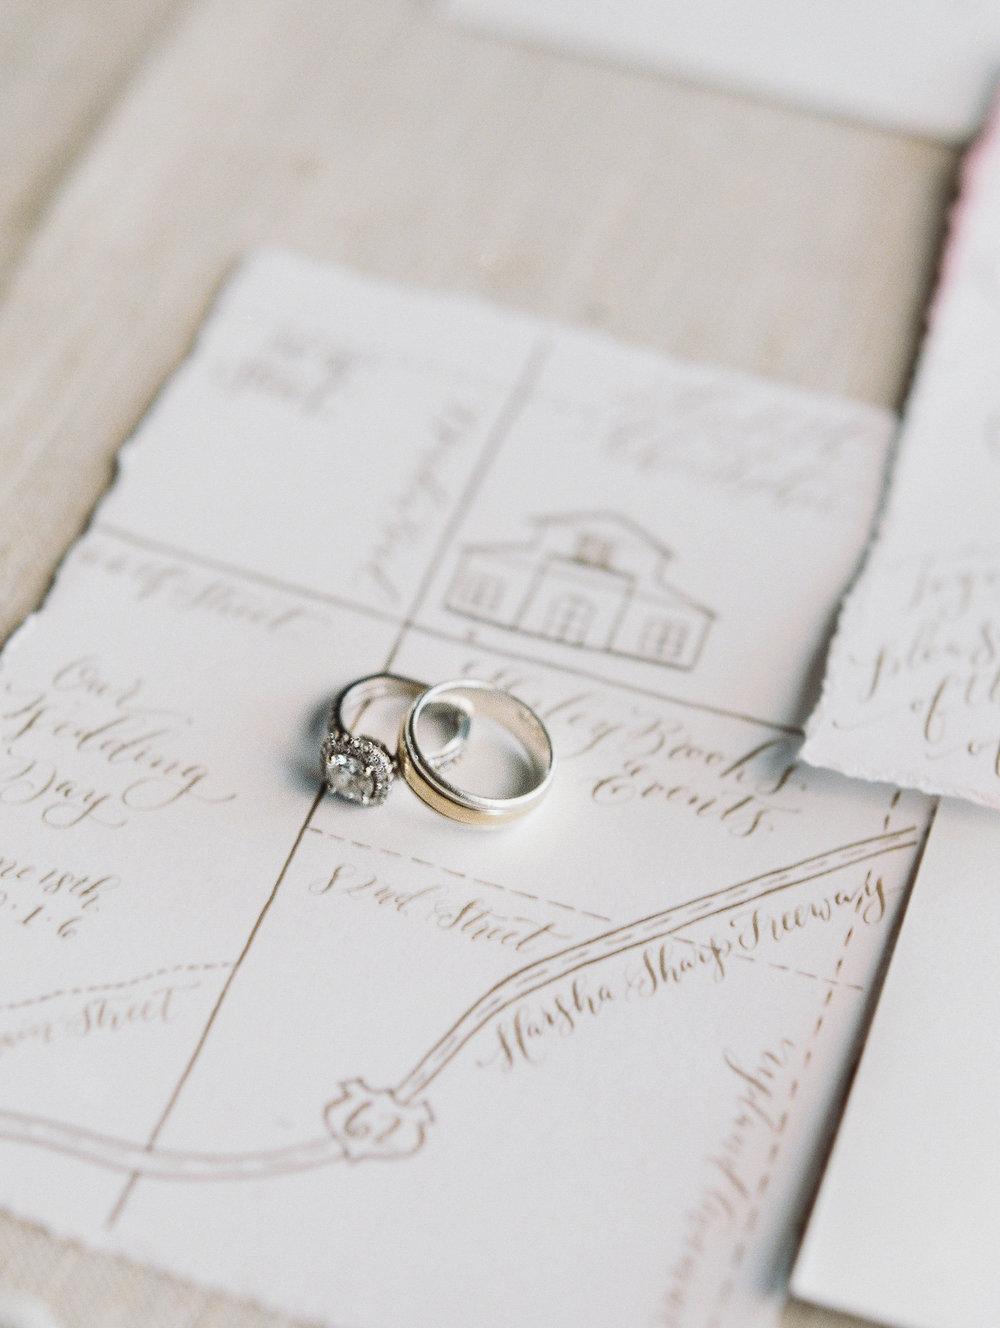 Hand-Painted Wedding Details: Where can I use them? — Brush & Nib ...